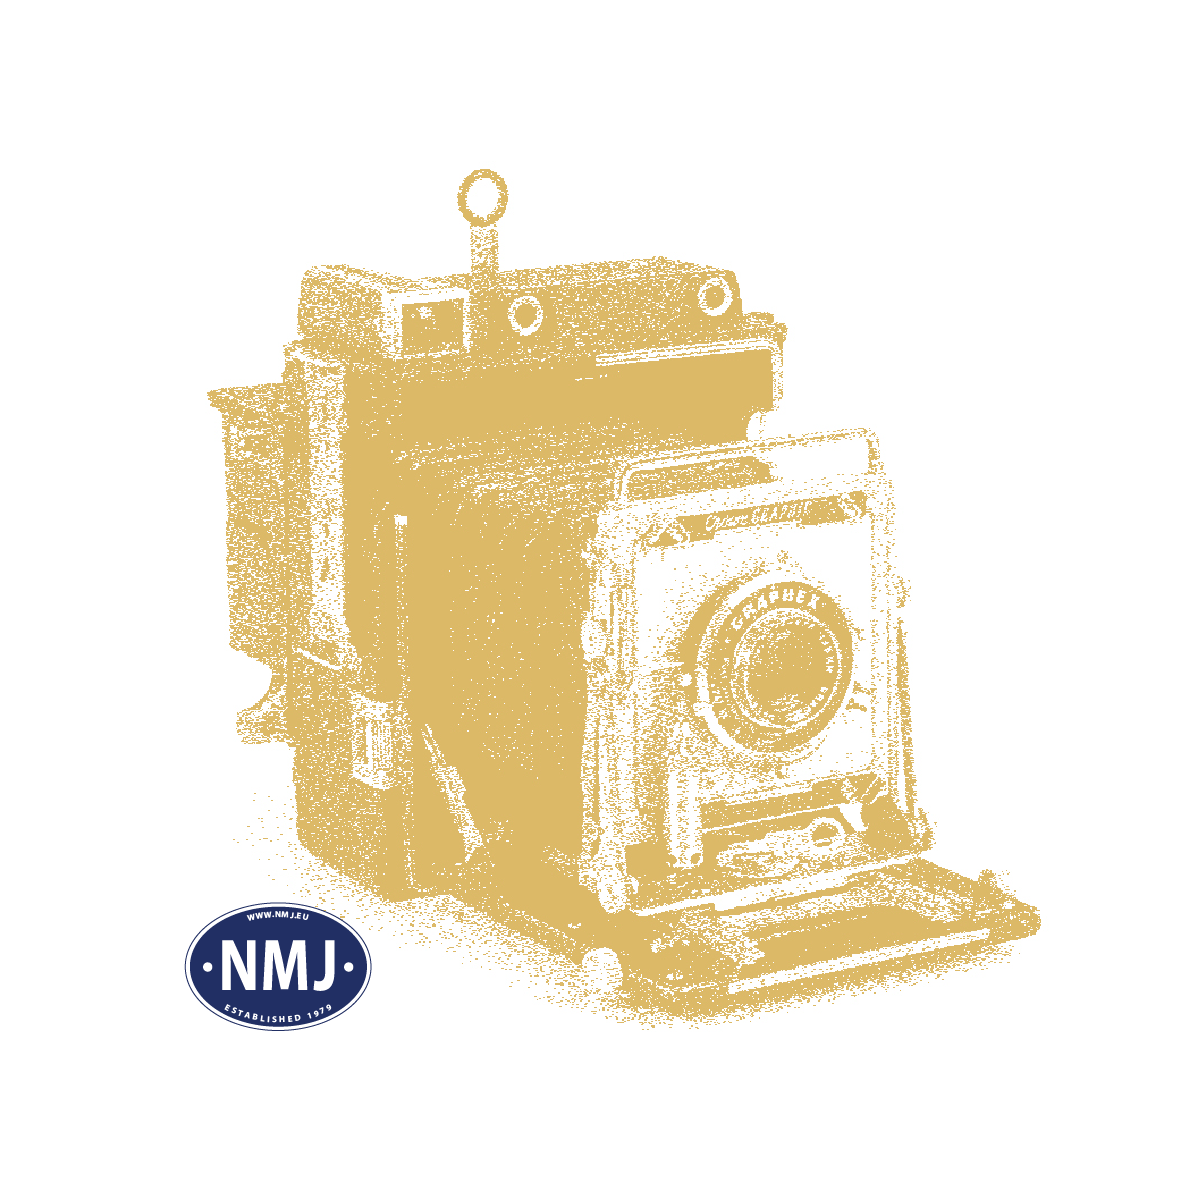 NMJT90017 - NMJ Topline NSB Di3a.605 Nydesign OL-logo 1994, DC